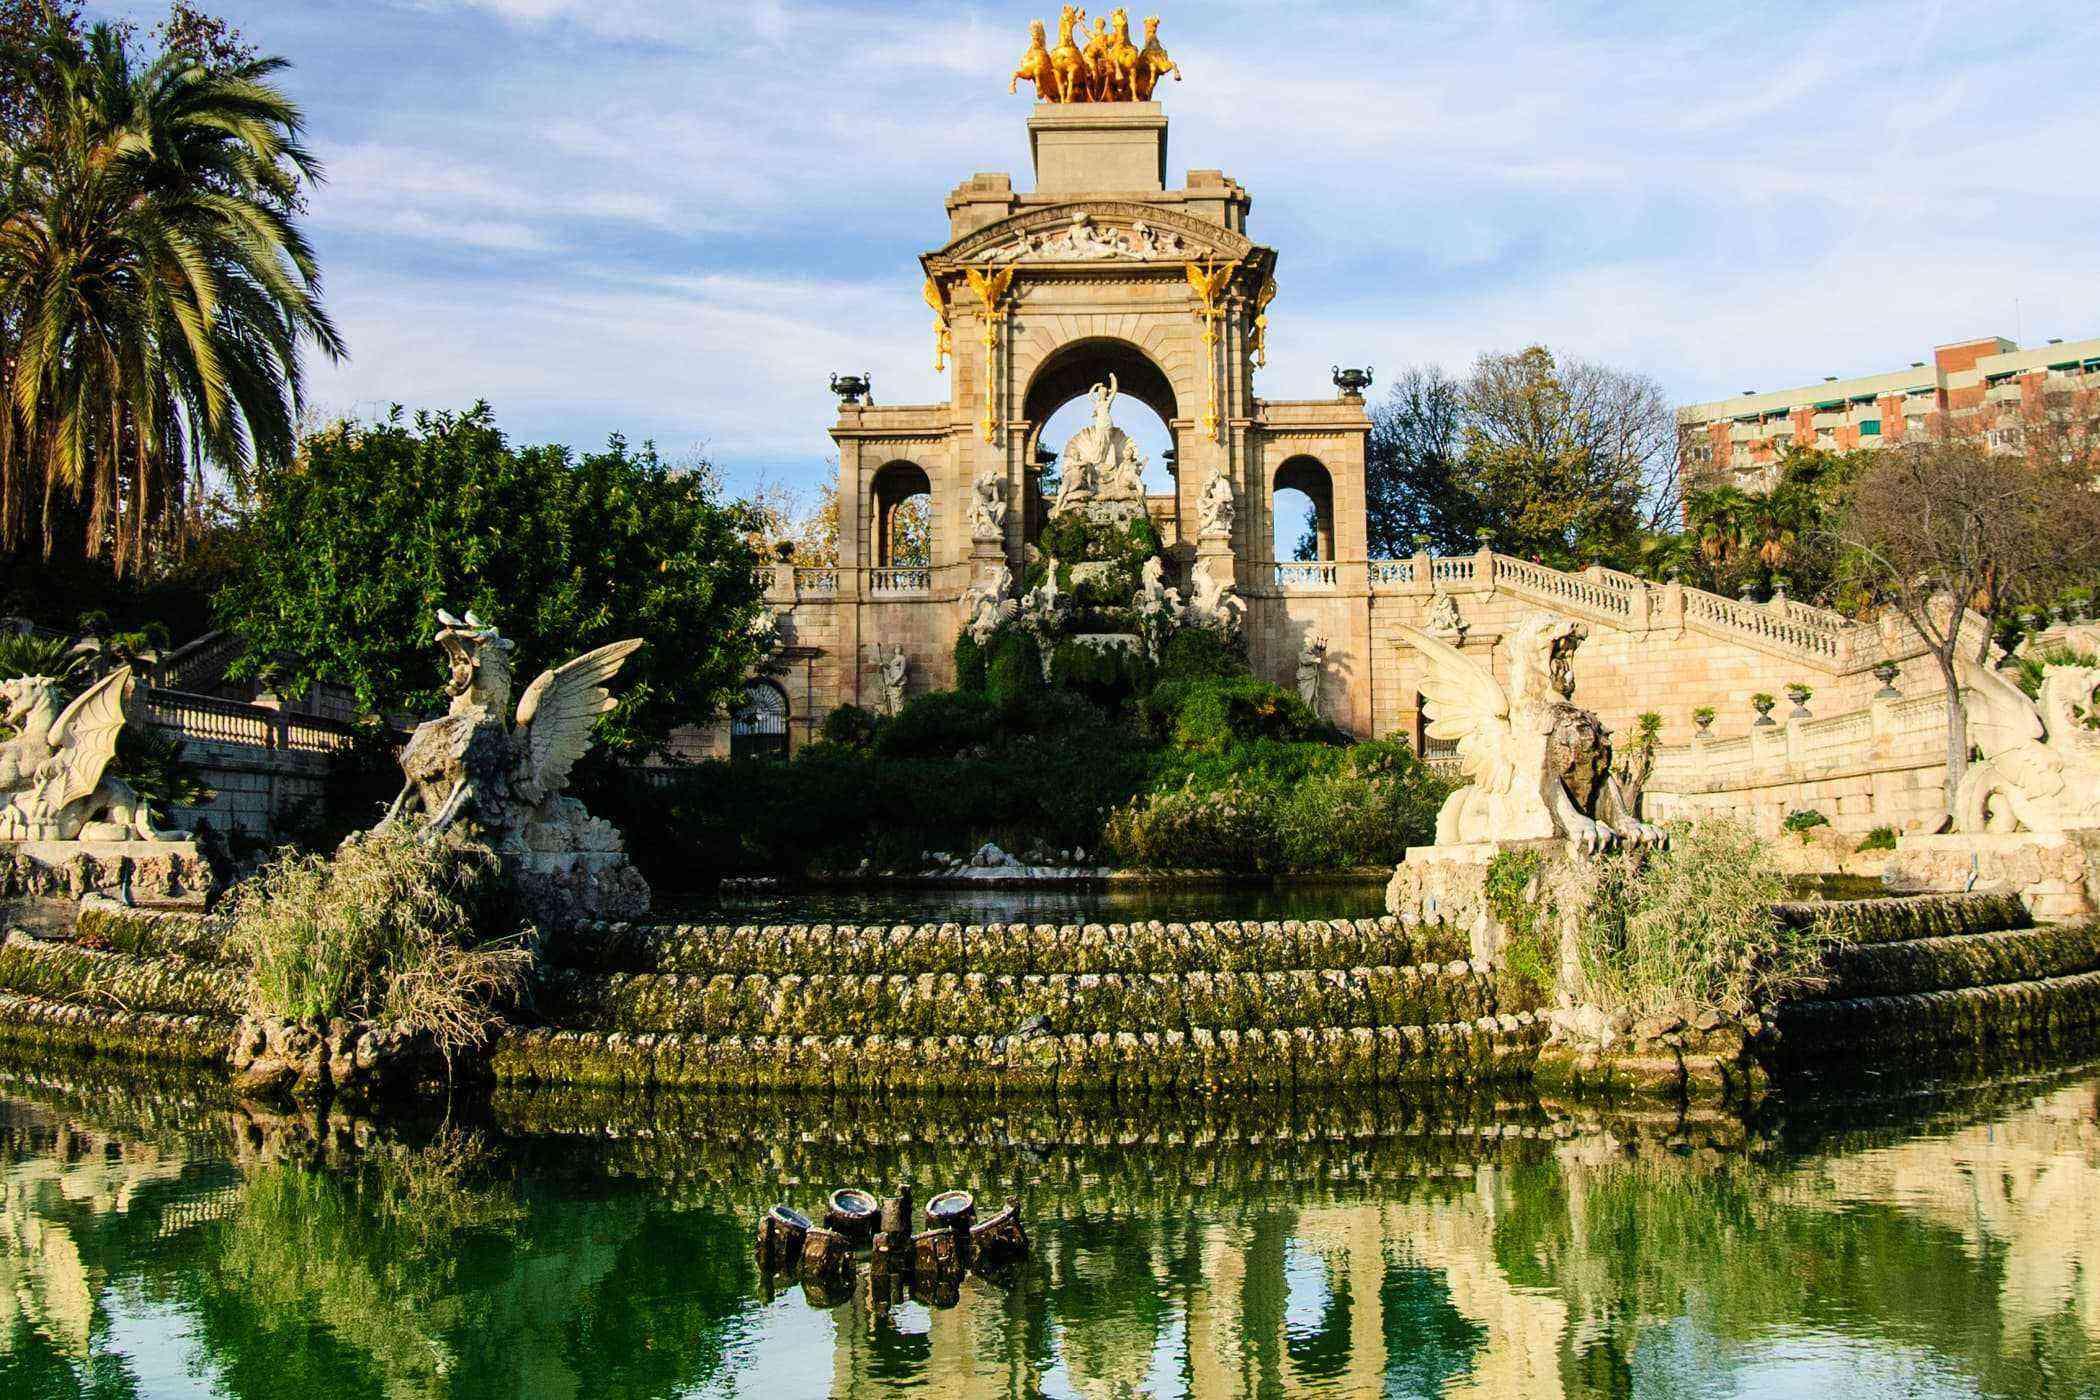 22 Parc de la Ciutadella